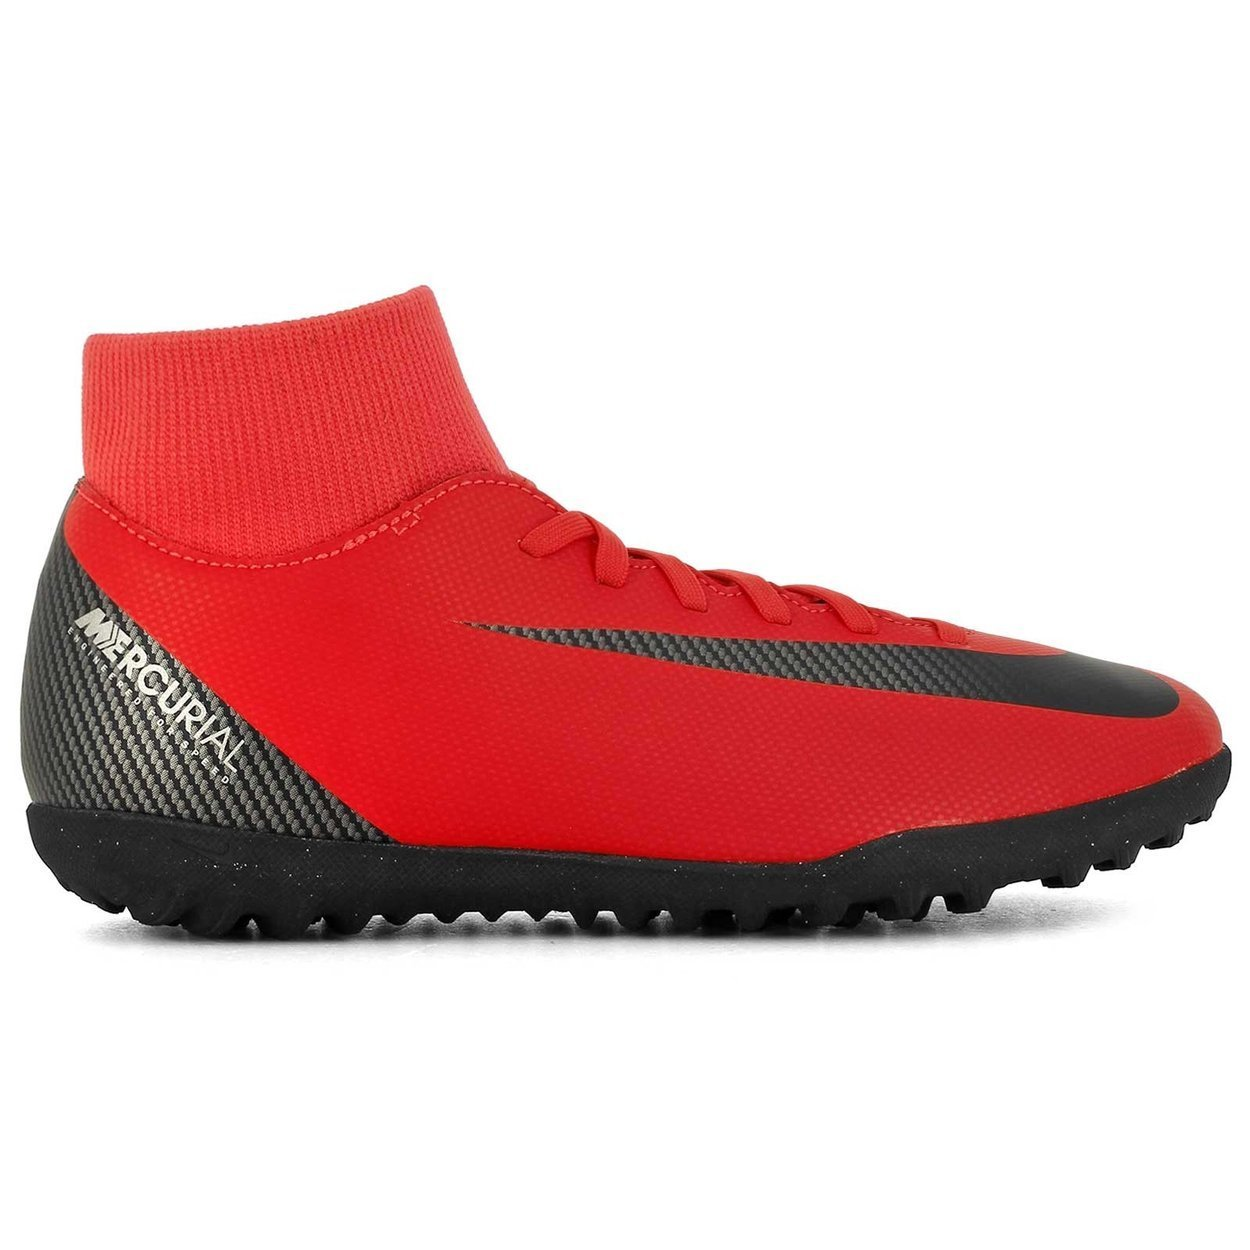 Buty turfy na orlik Nike Mercurial Superfly Club CR7 TF AJ3570 600